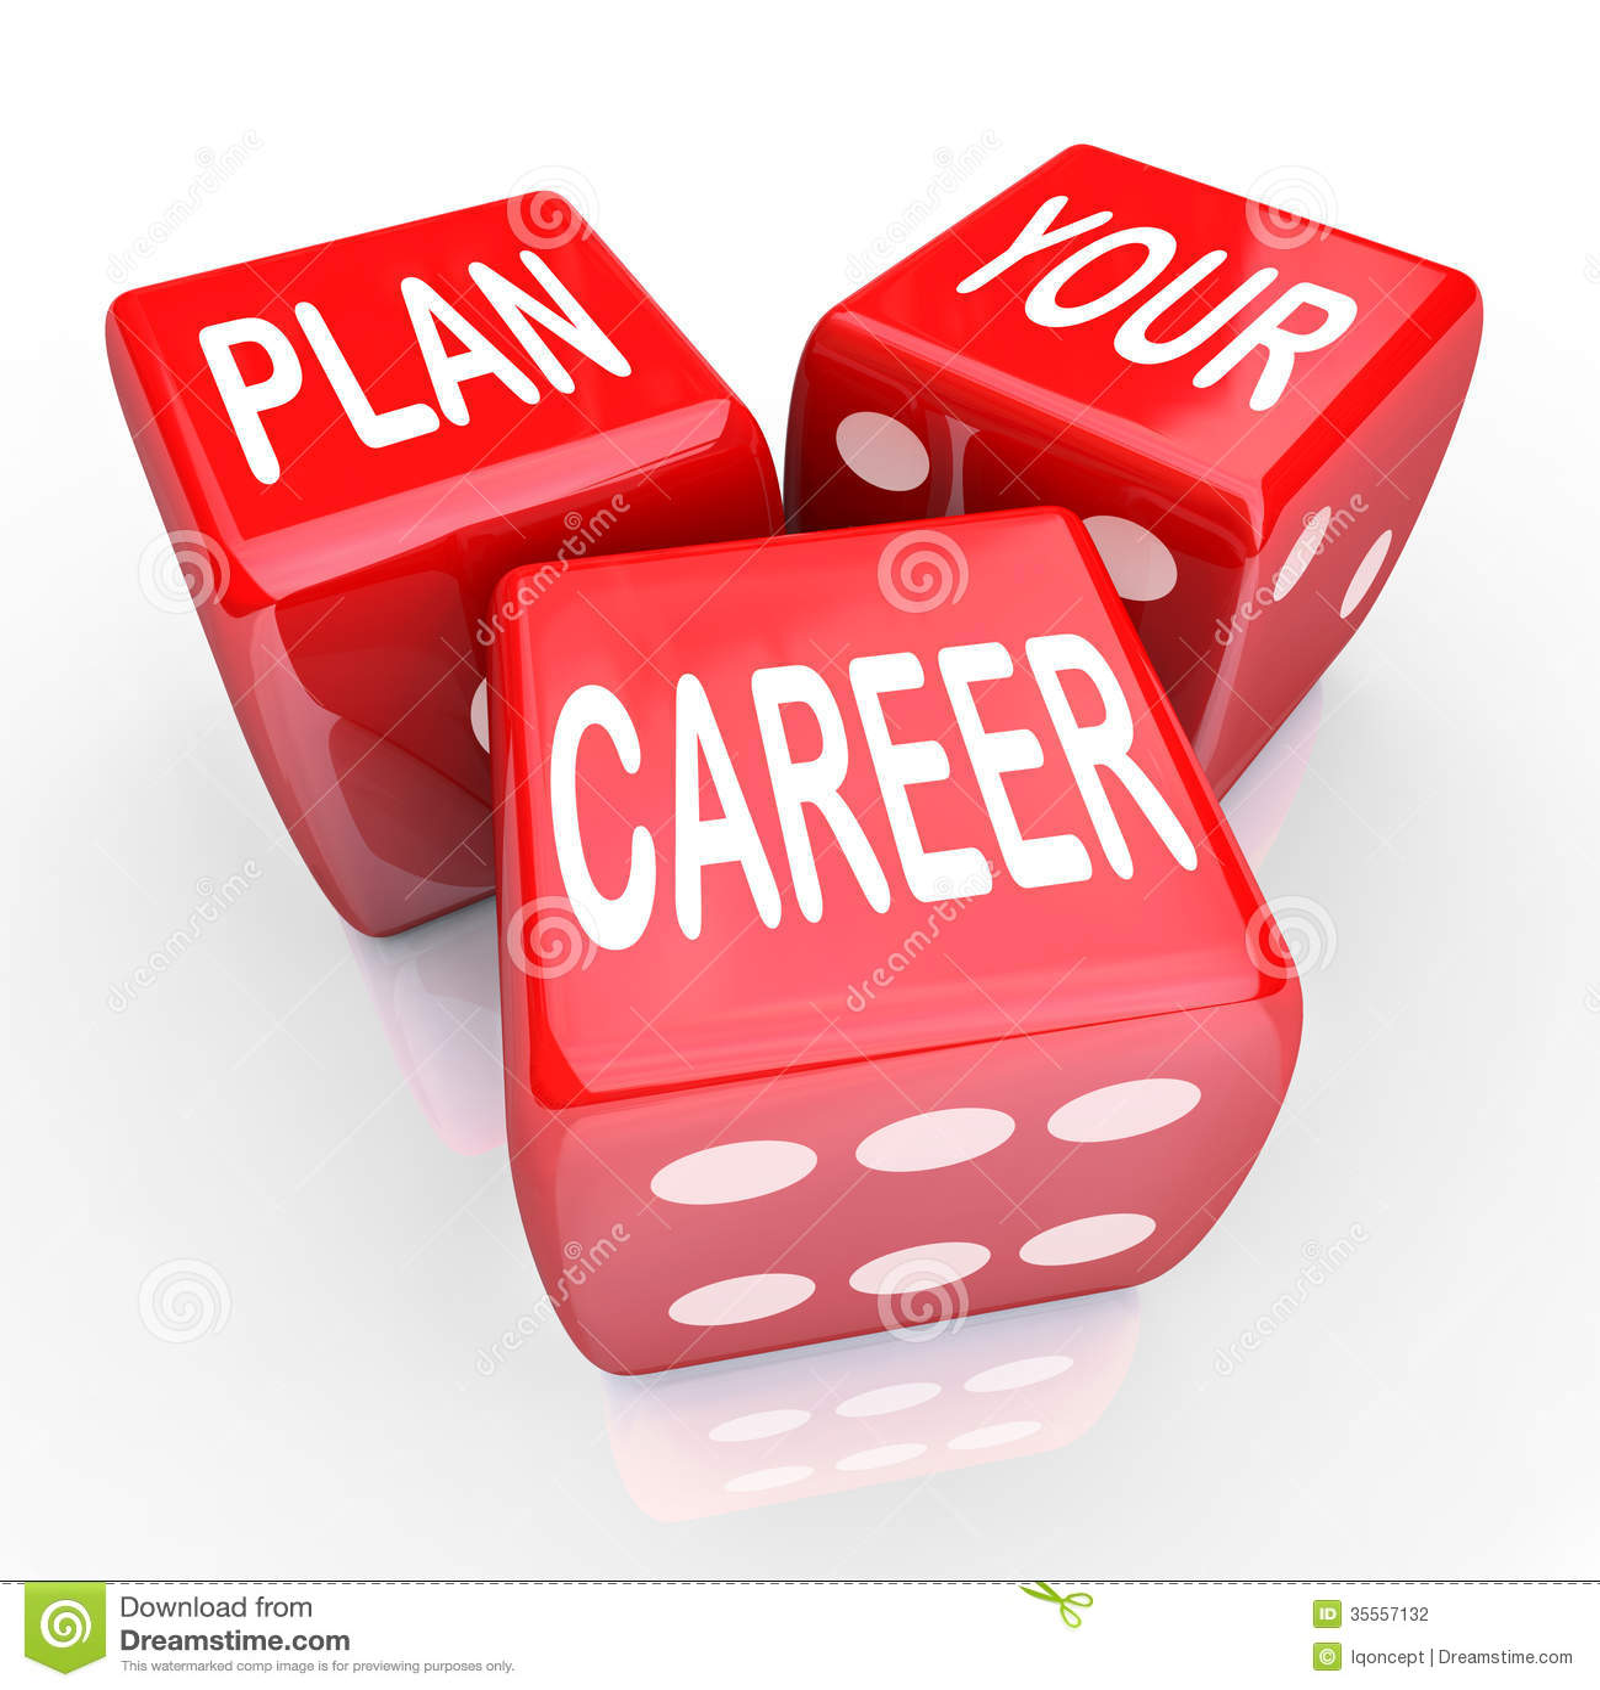 how to make business plan in urdu cover letter templates how to make business plan in urdu bawaseer ka ilaj in urdu internal external hemorrhoids plan